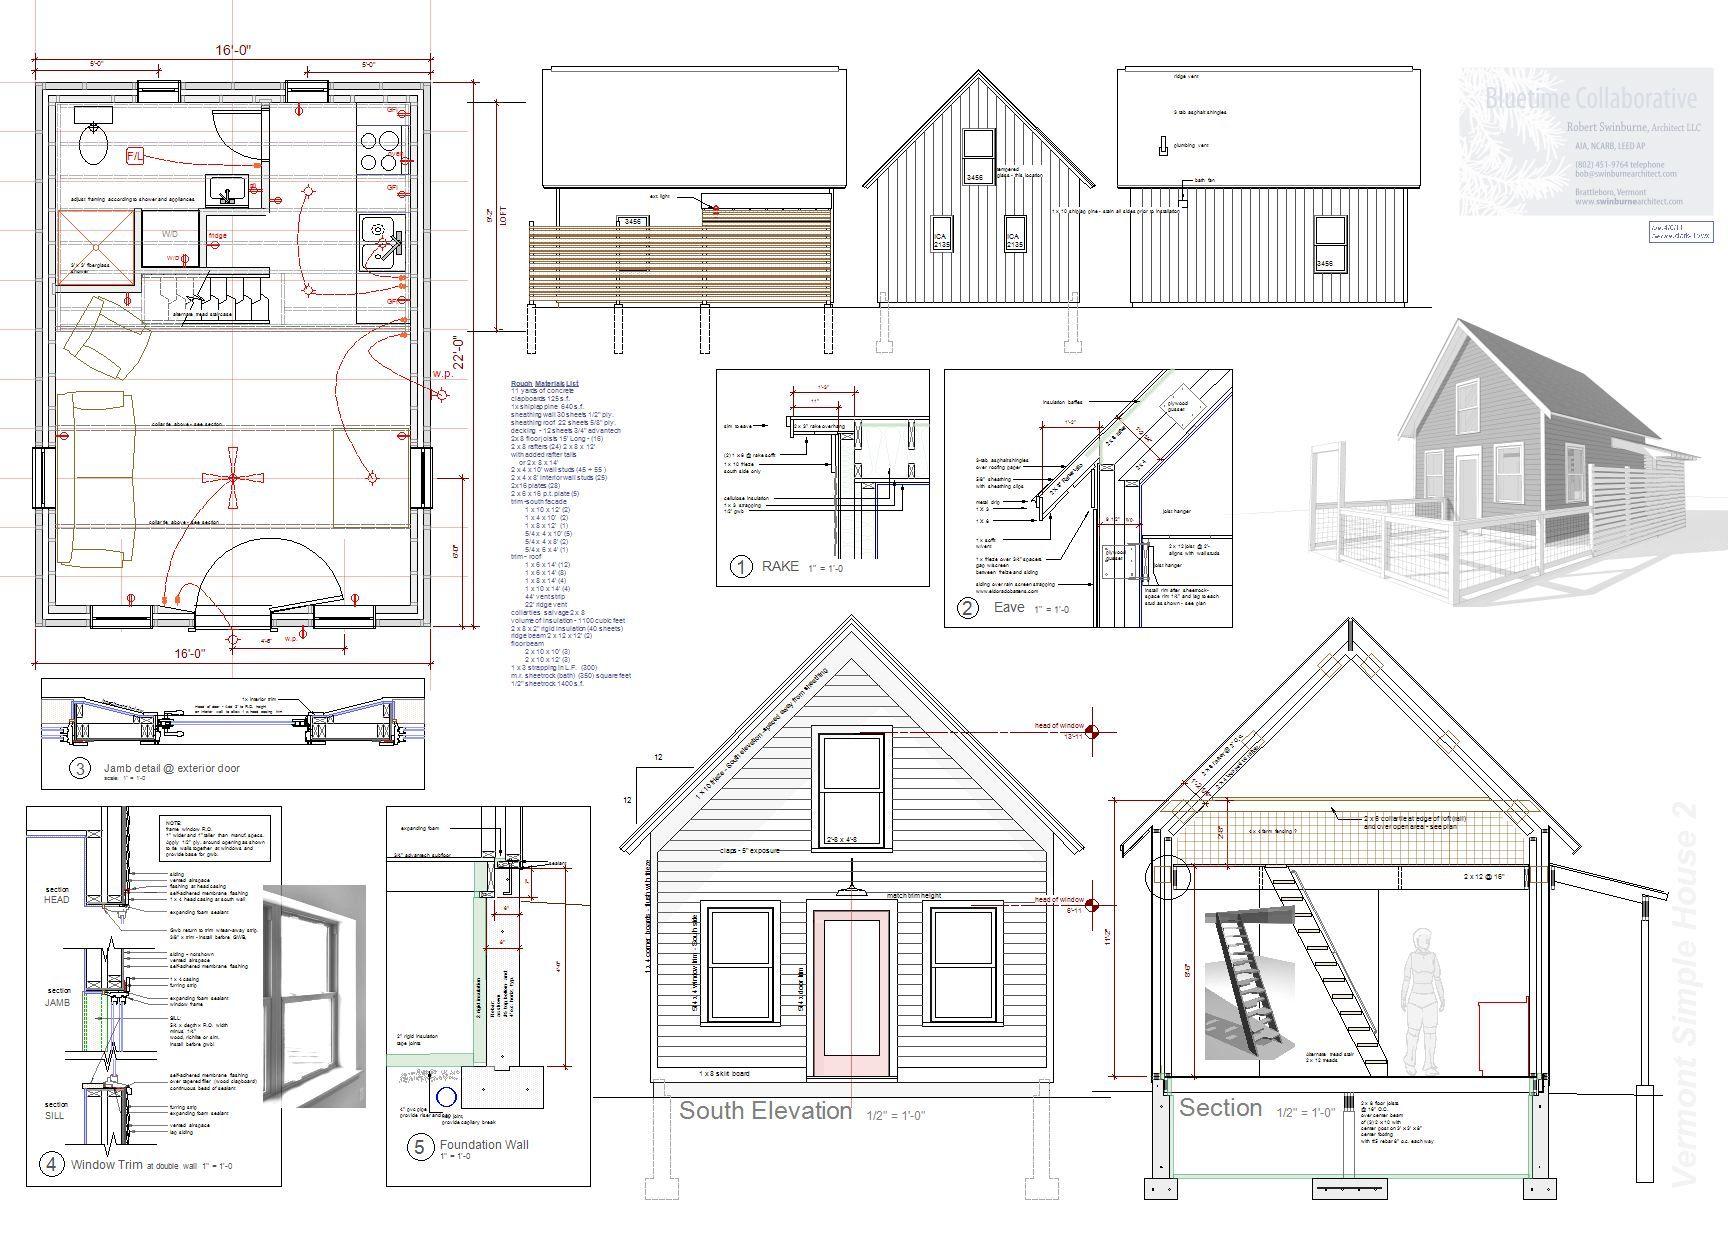 Superb 17 Best Images About Tiny House Plans Design Ideas On Pinterest Largest Home Design Picture Inspirations Pitcheantrous